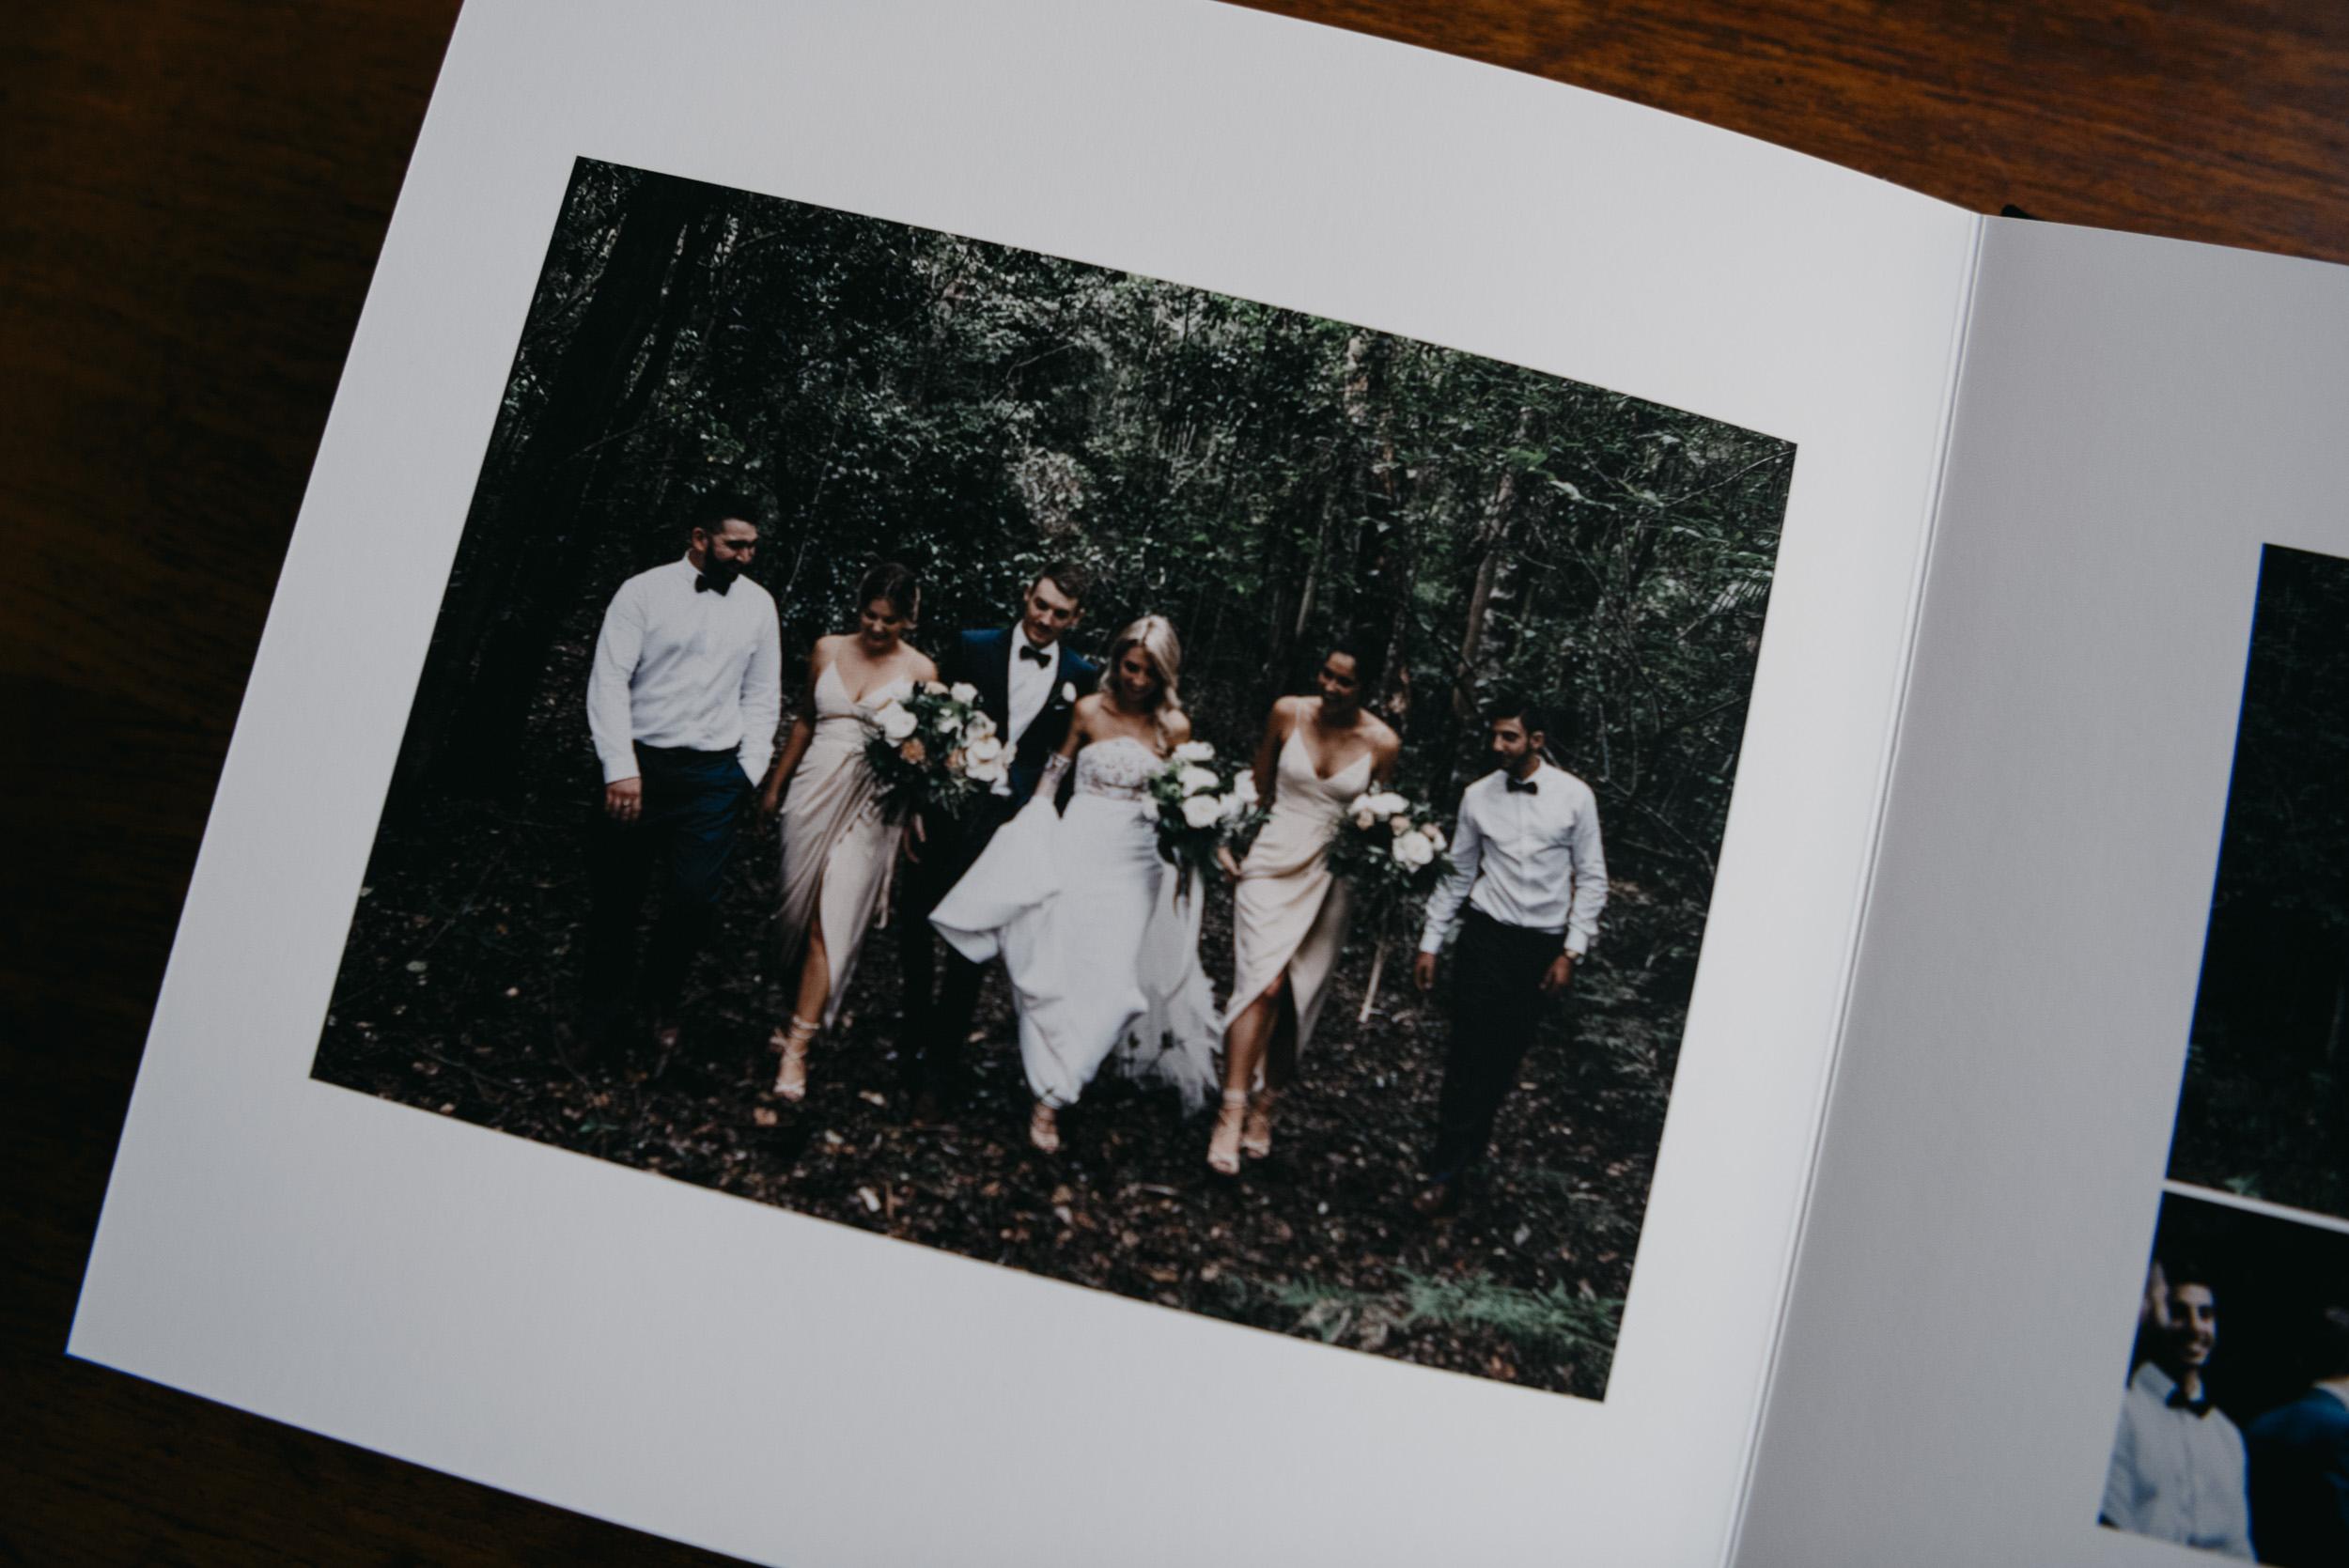 Fine_art_wedding_album_jason_corroto-Photo (10 of 11).jpg